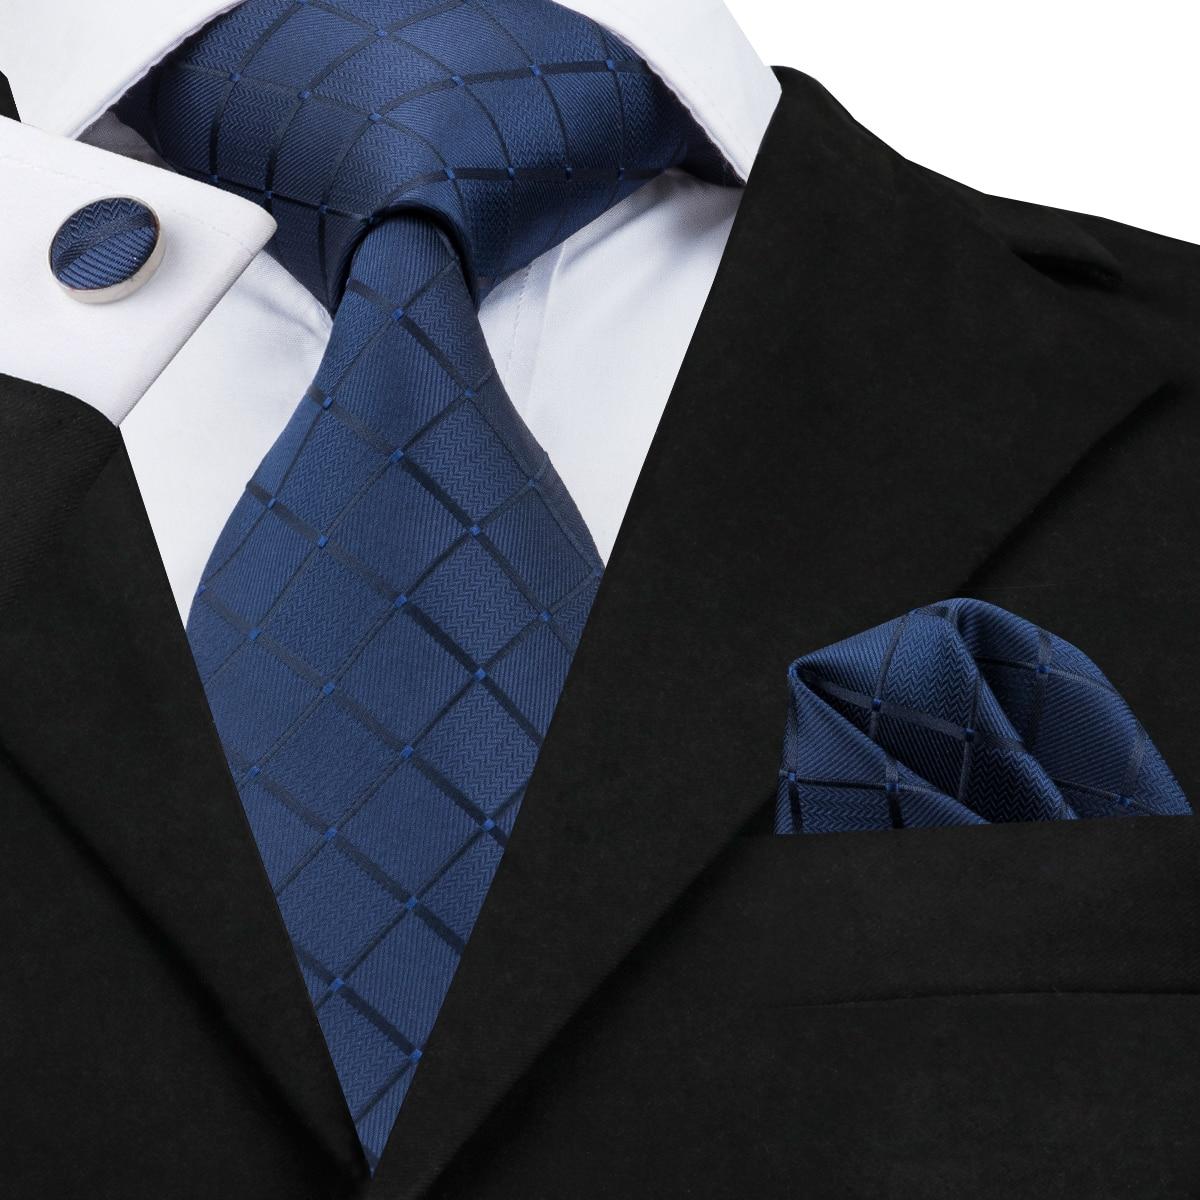 Hi-Tie Hot Blue Silk Tie Plaid Jacquare Woven Ties For Men Necktie And Pocket Square Cufflink Blue Men Tie Set Cravats SN-1656